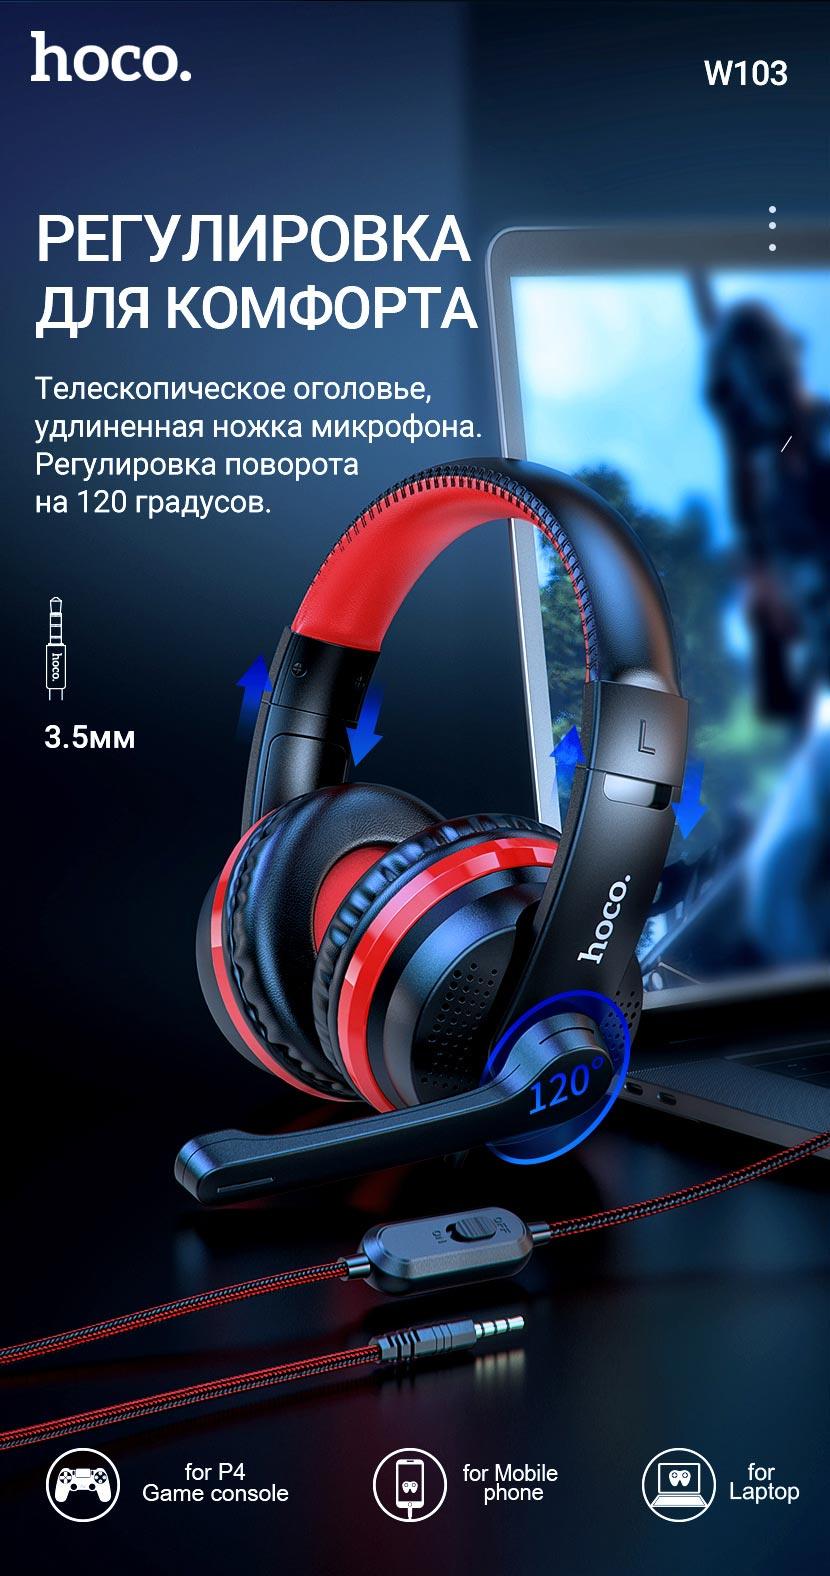 hoco news w103 magic tour gaming headphones adjustment ru